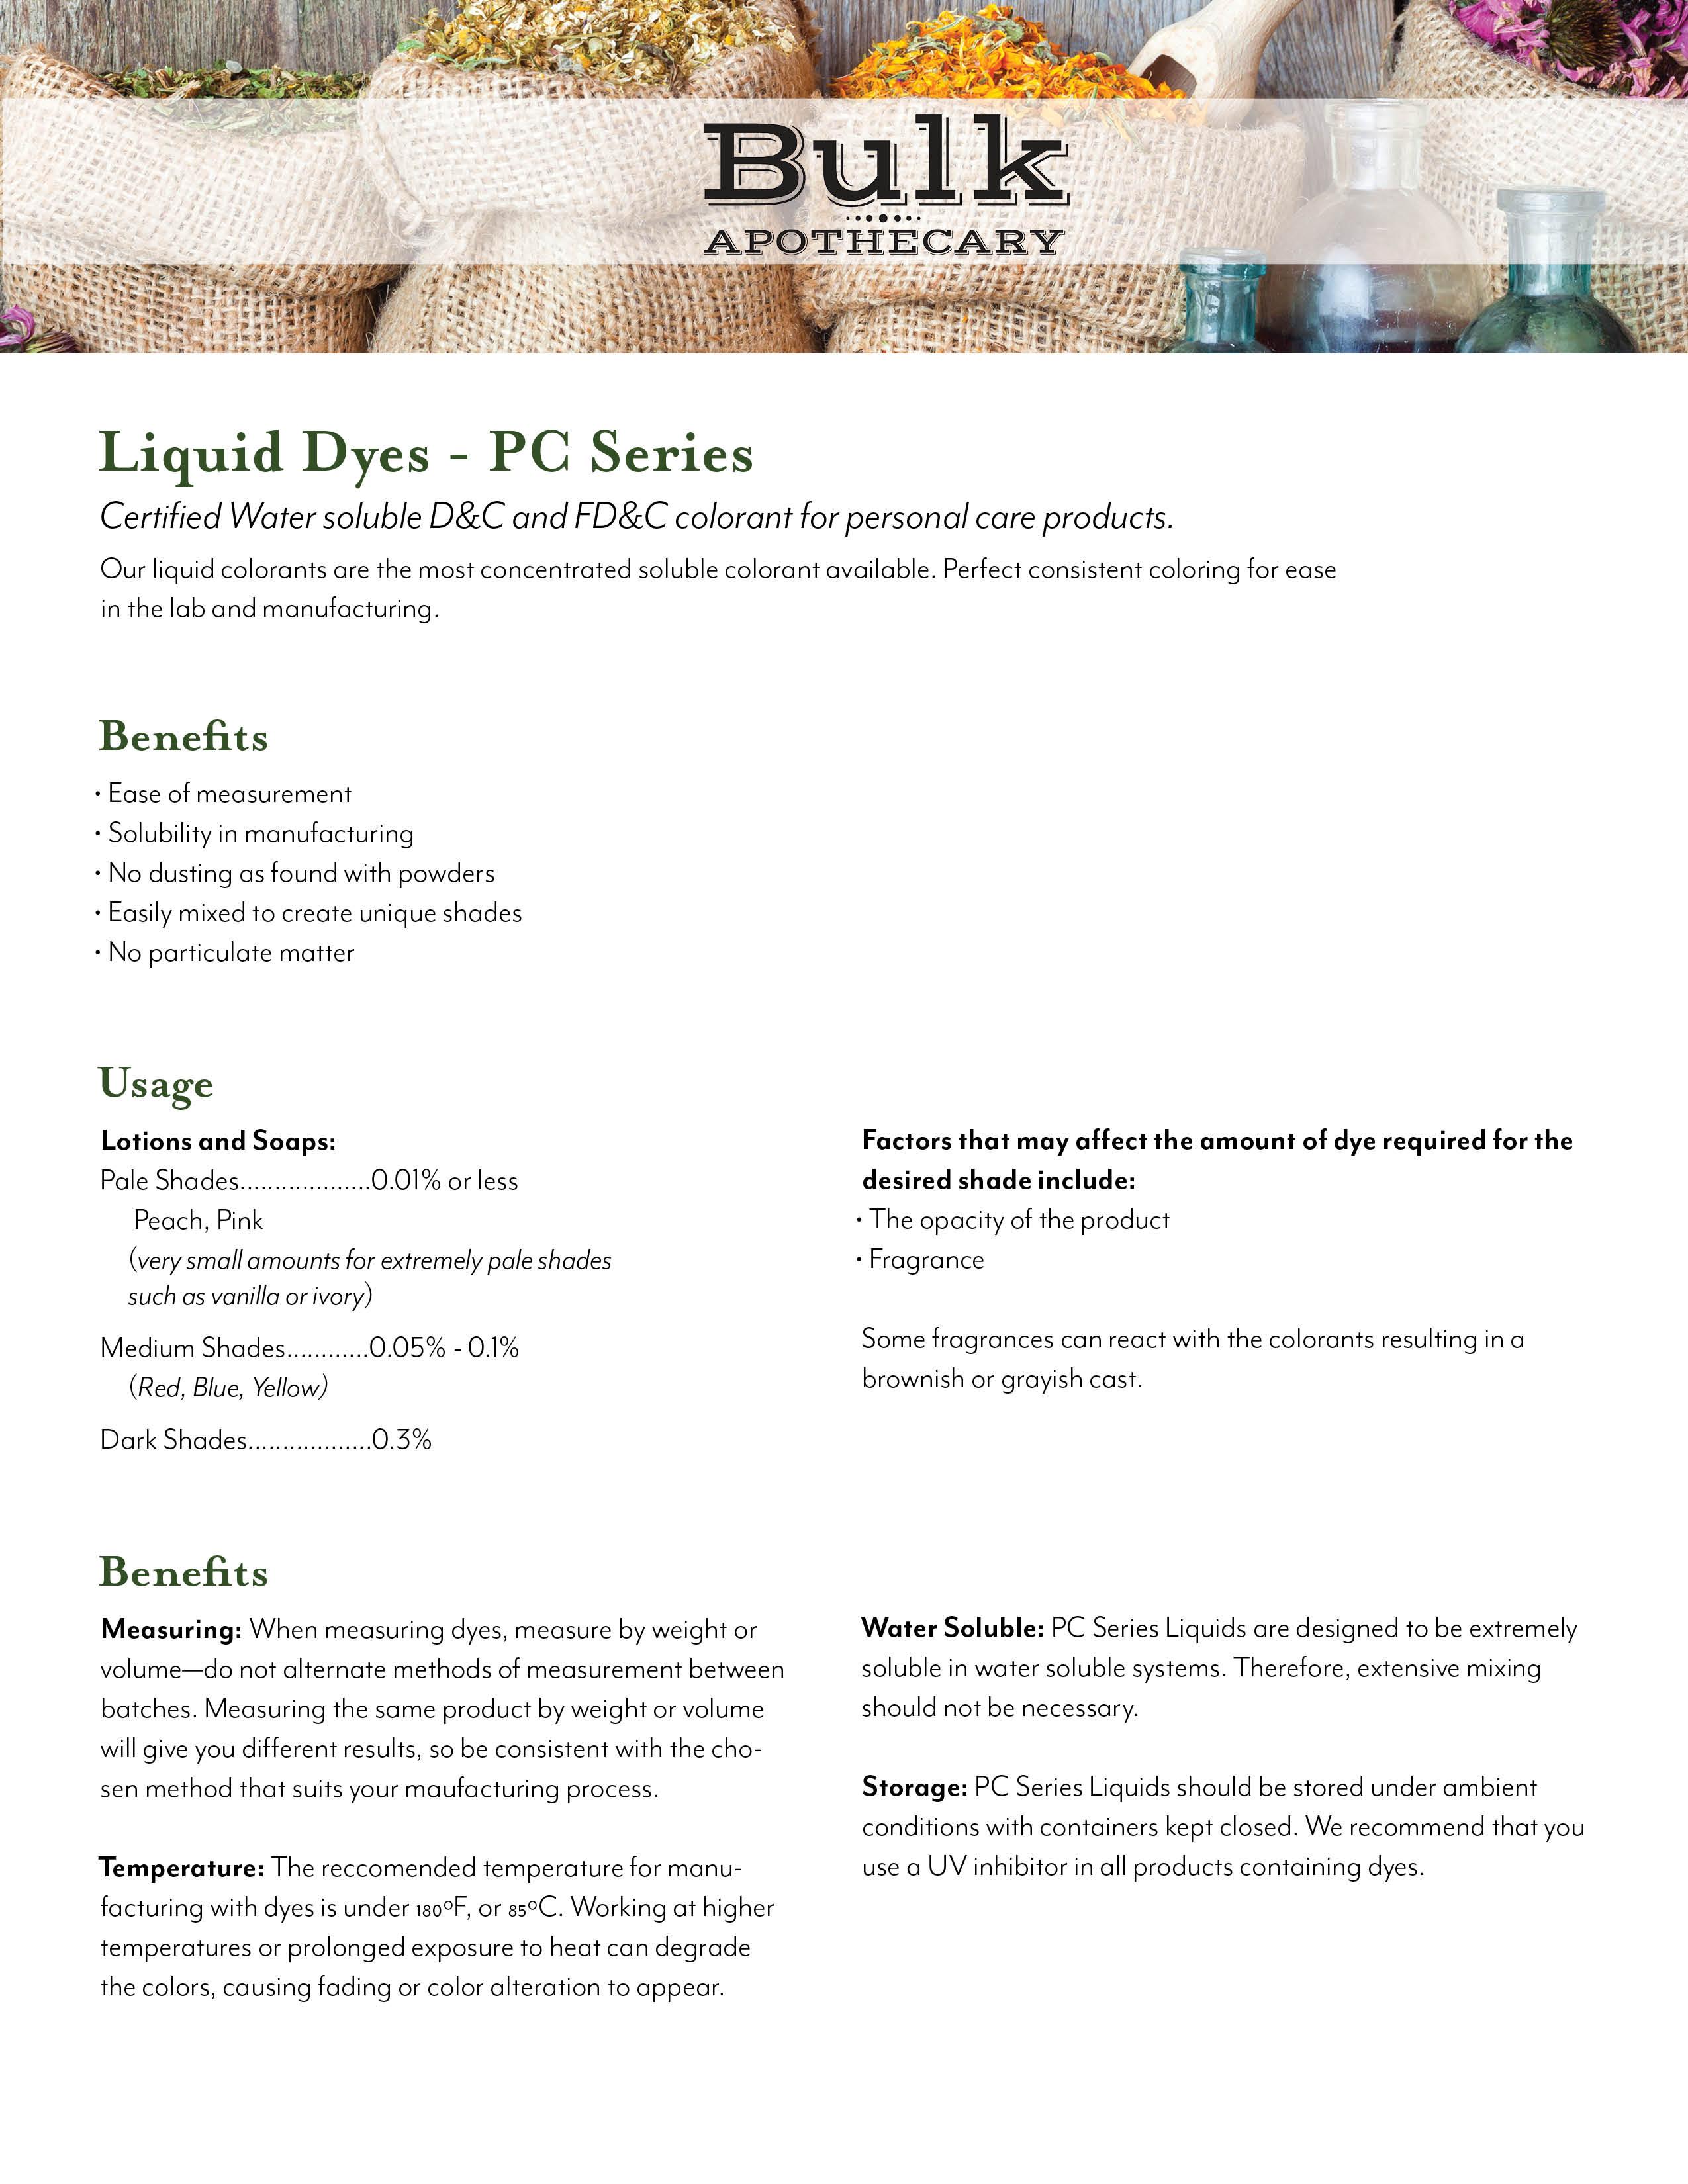 liquid-dyes-information.jpg